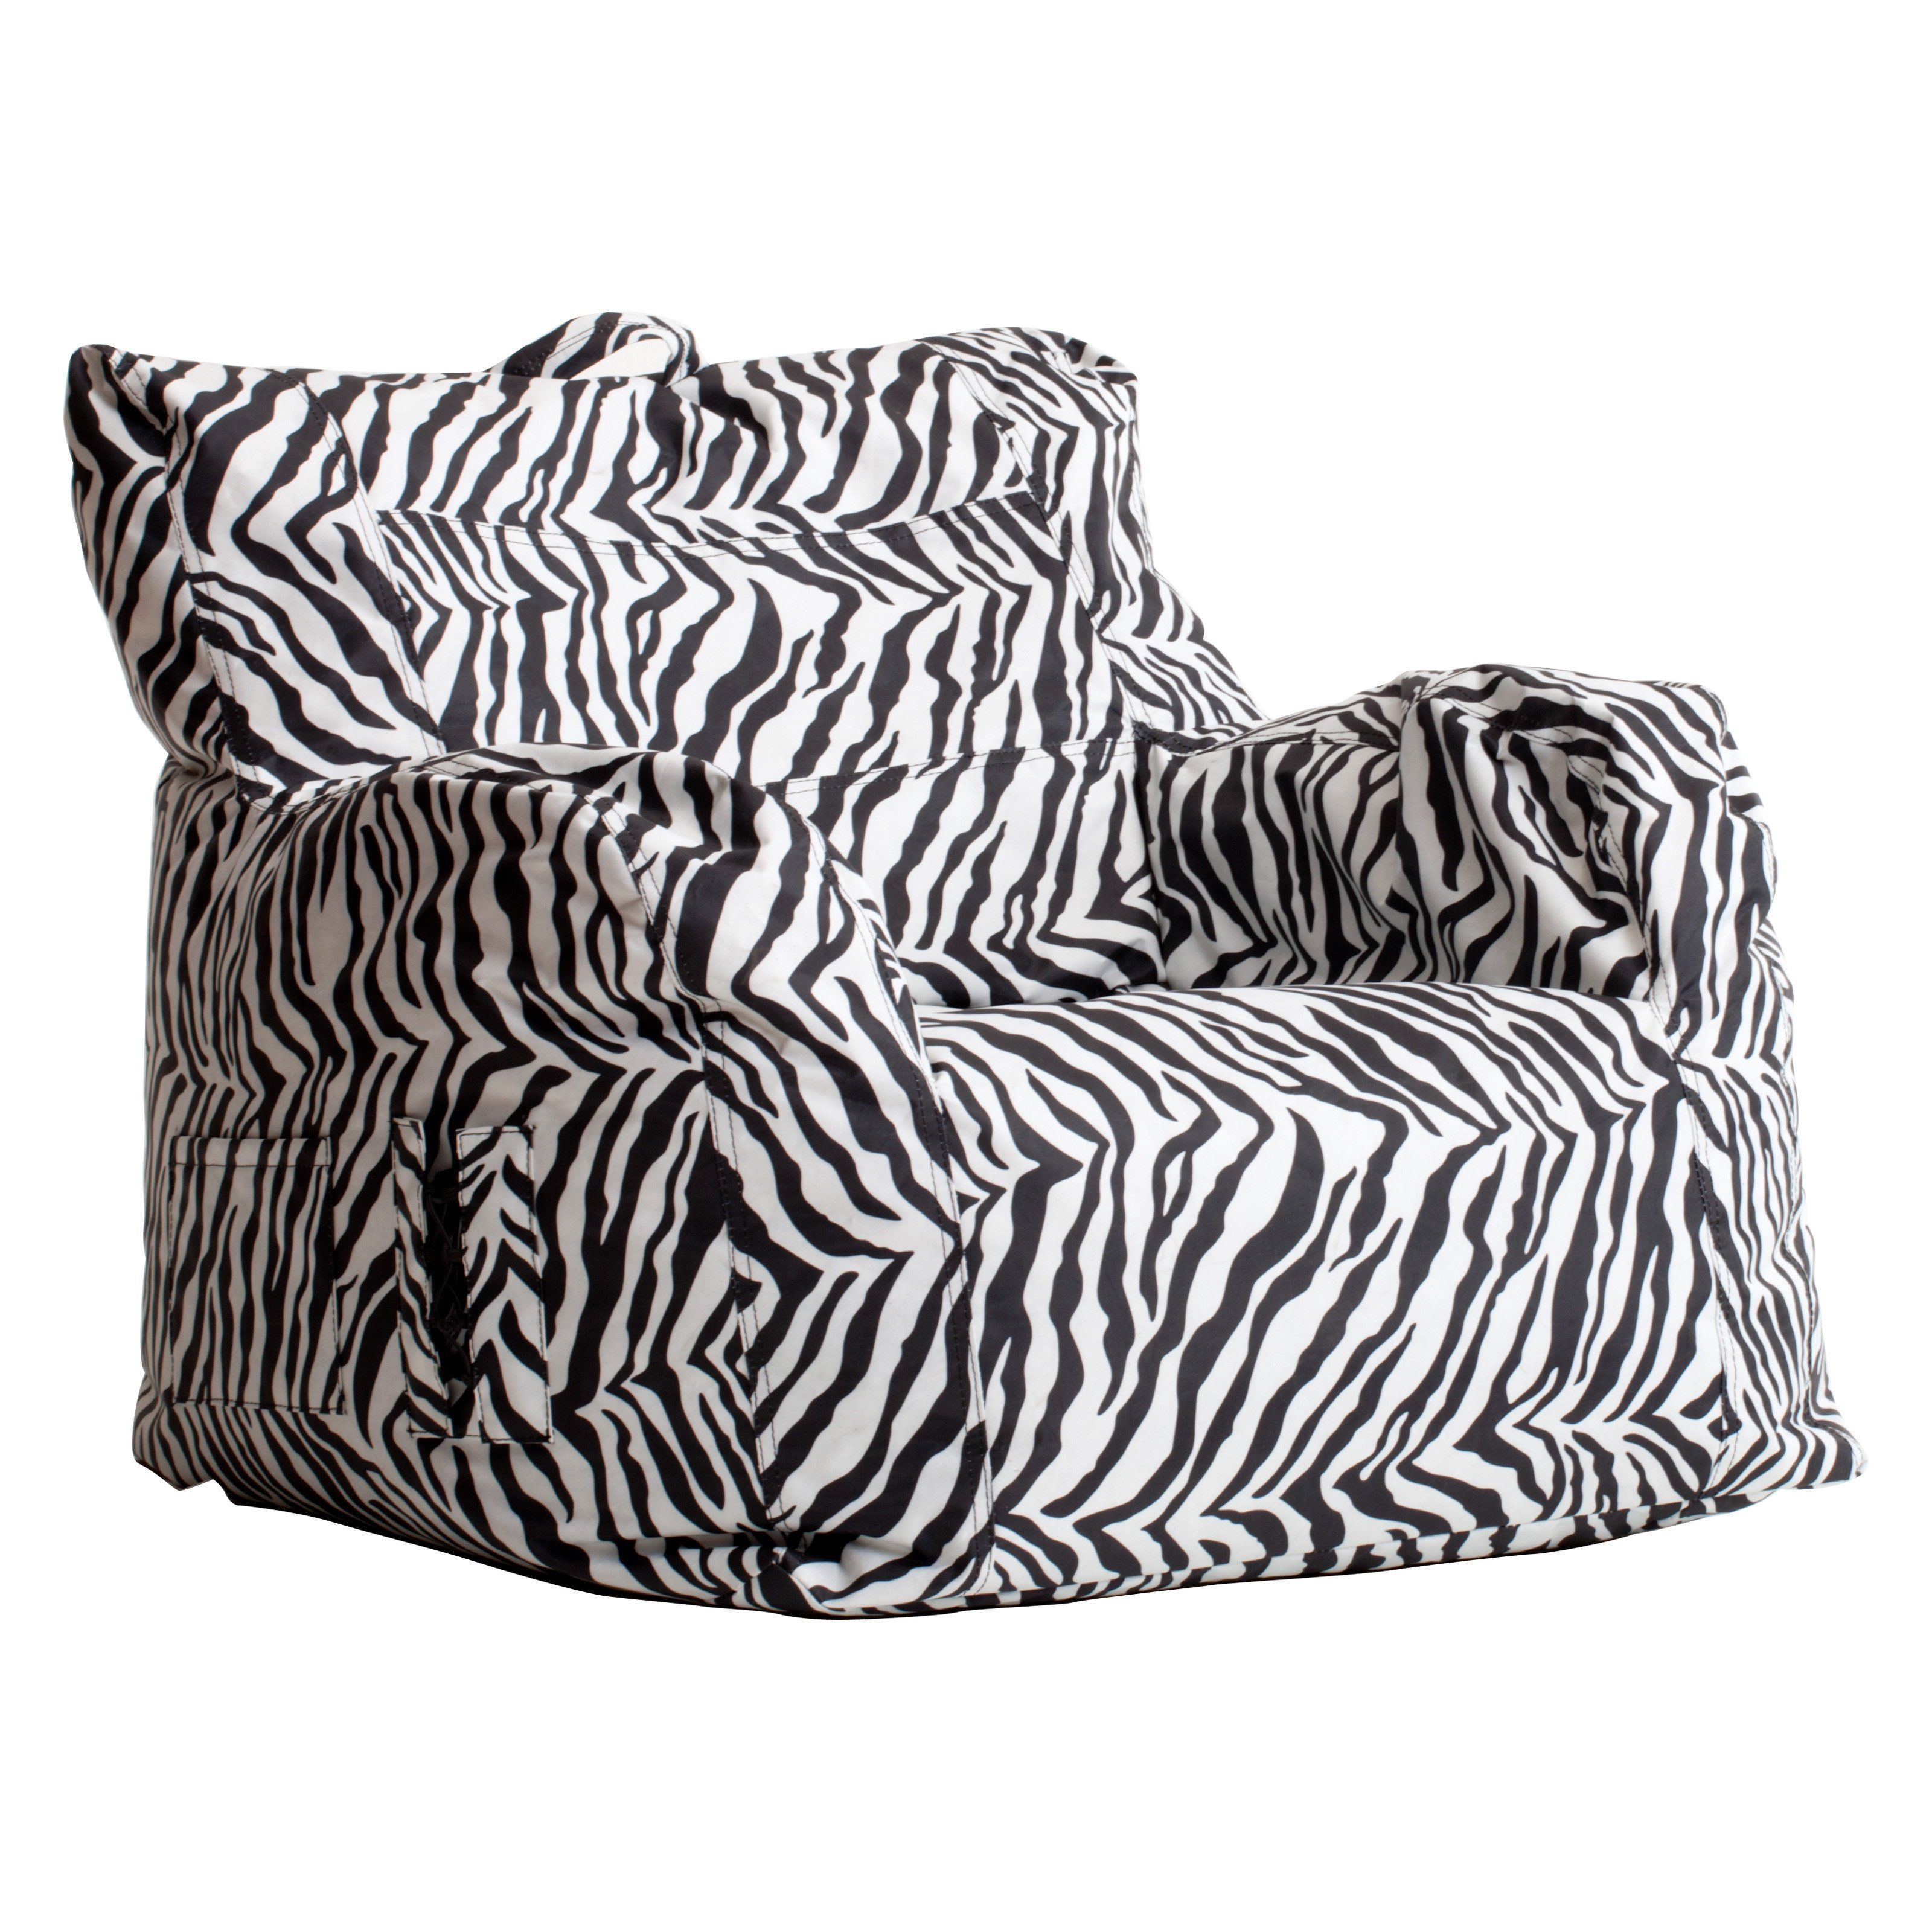 Big Joe Dorm Bean Bag Chair Zebra Bean bag chair, Dorm